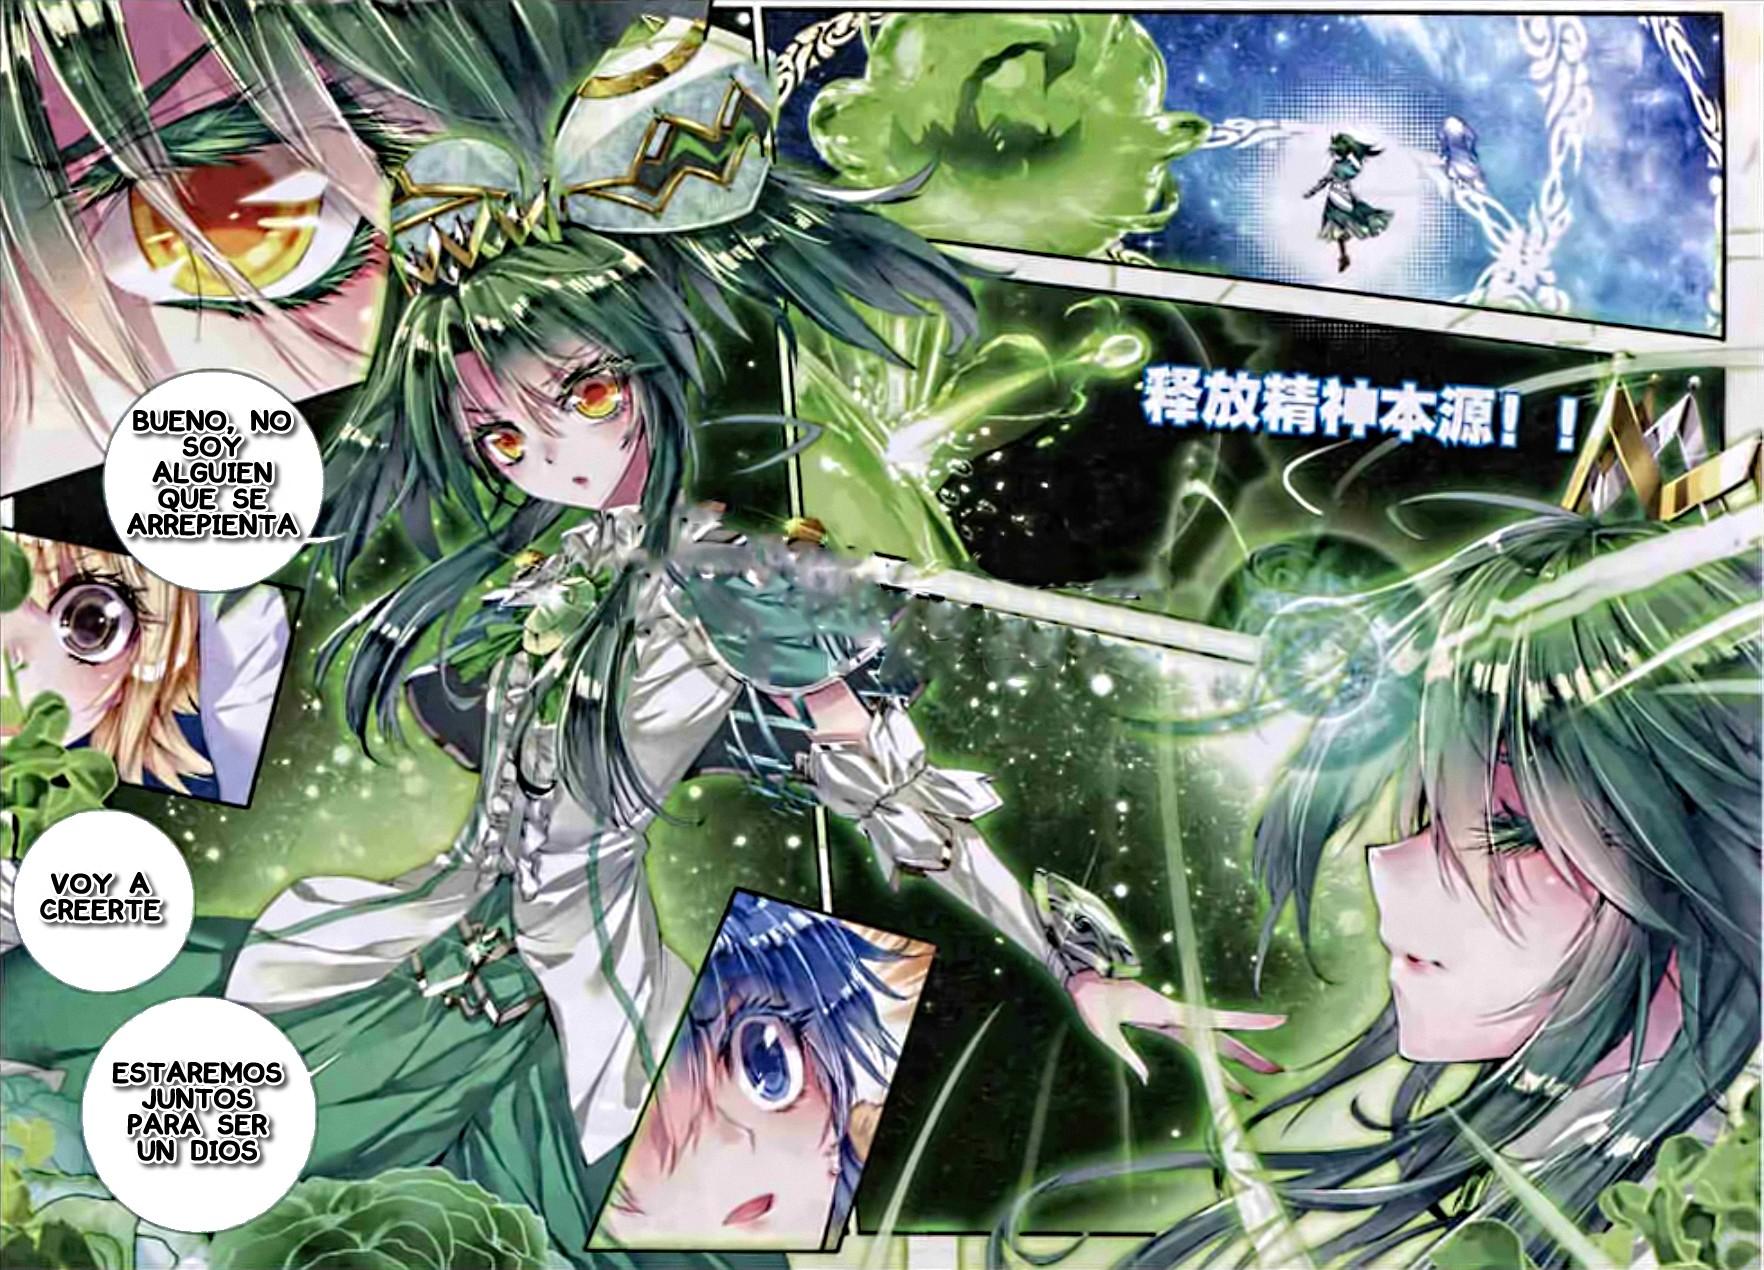 http://c5.ninemanga.com/es_manga/33/16417/429656/424351fe60d01ce7de0fb0e00956b222.jpg Page 10